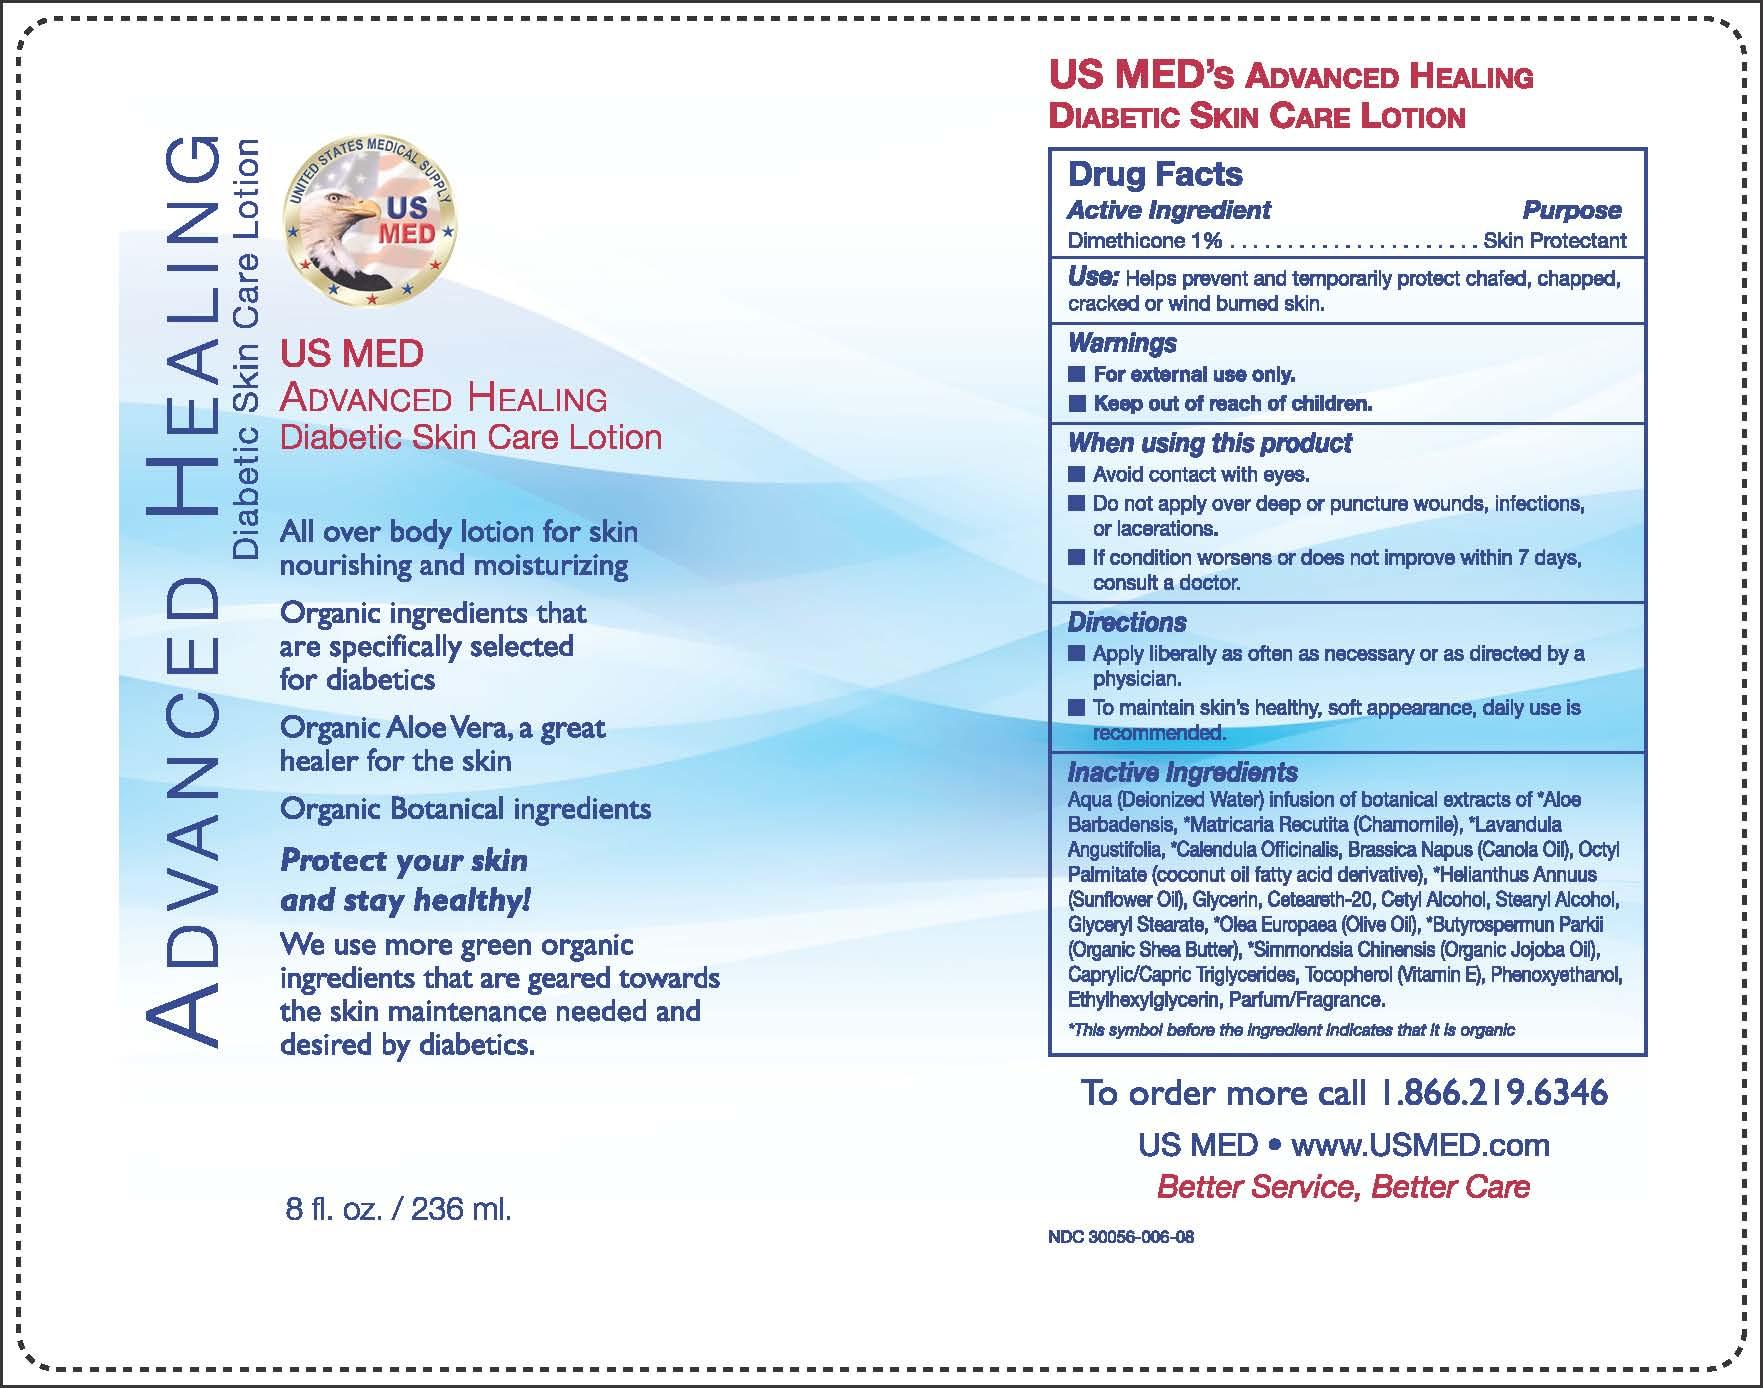 Advanced Healing Diabetic Skin Care (Dimethicone) Lotion [Eco-logics, Inc.]